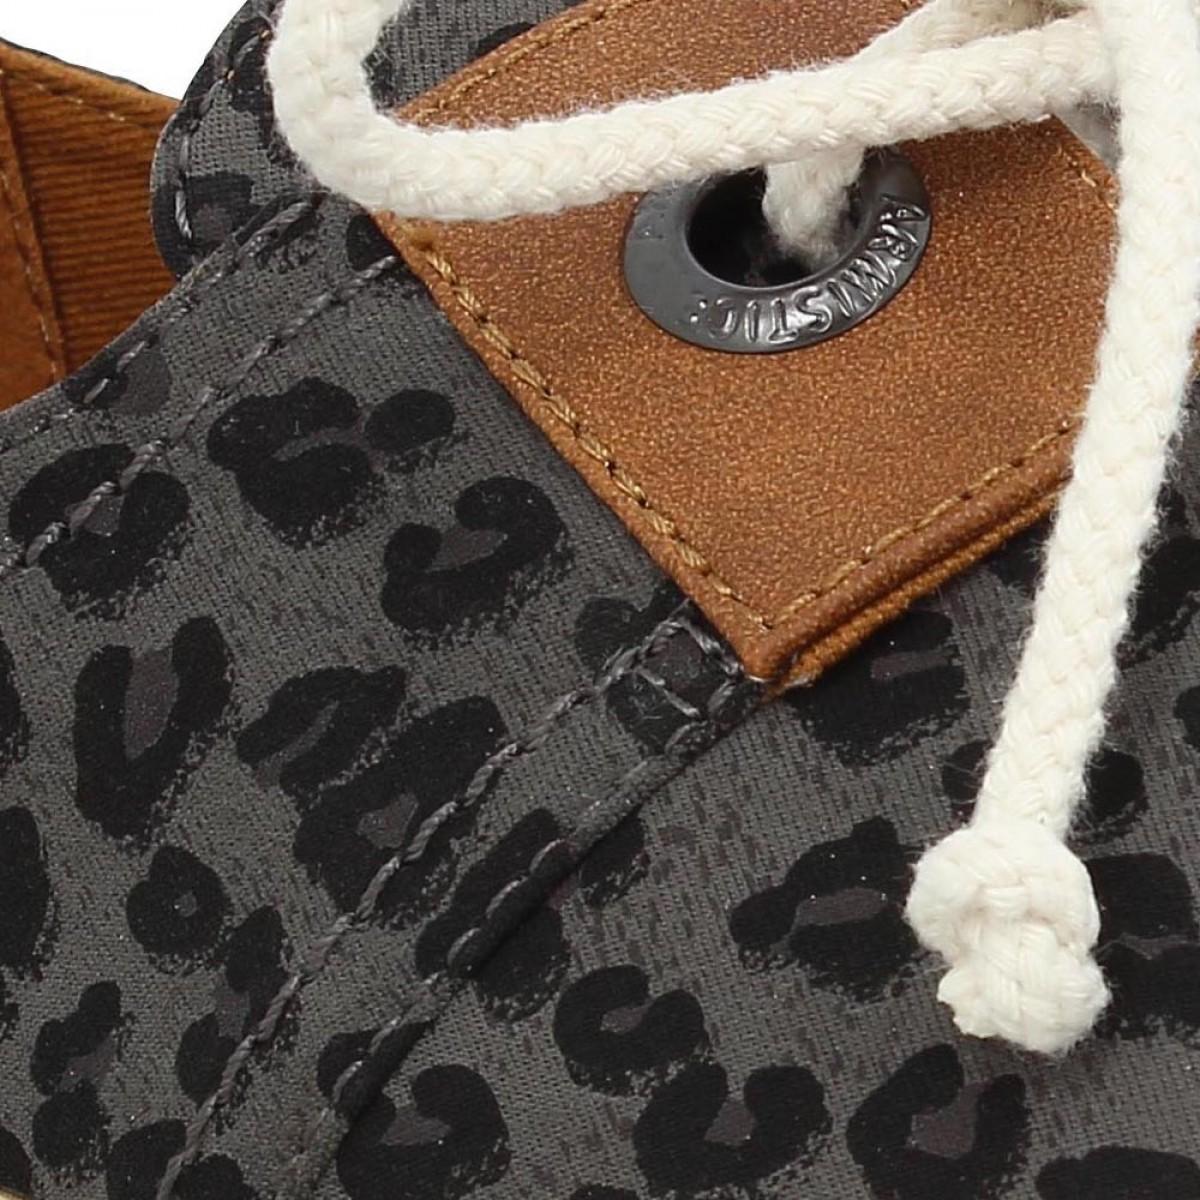 armistice stone one toile leopard femme gris femme fanny chaussures. Black Bedroom Furniture Sets. Home Design Ideas